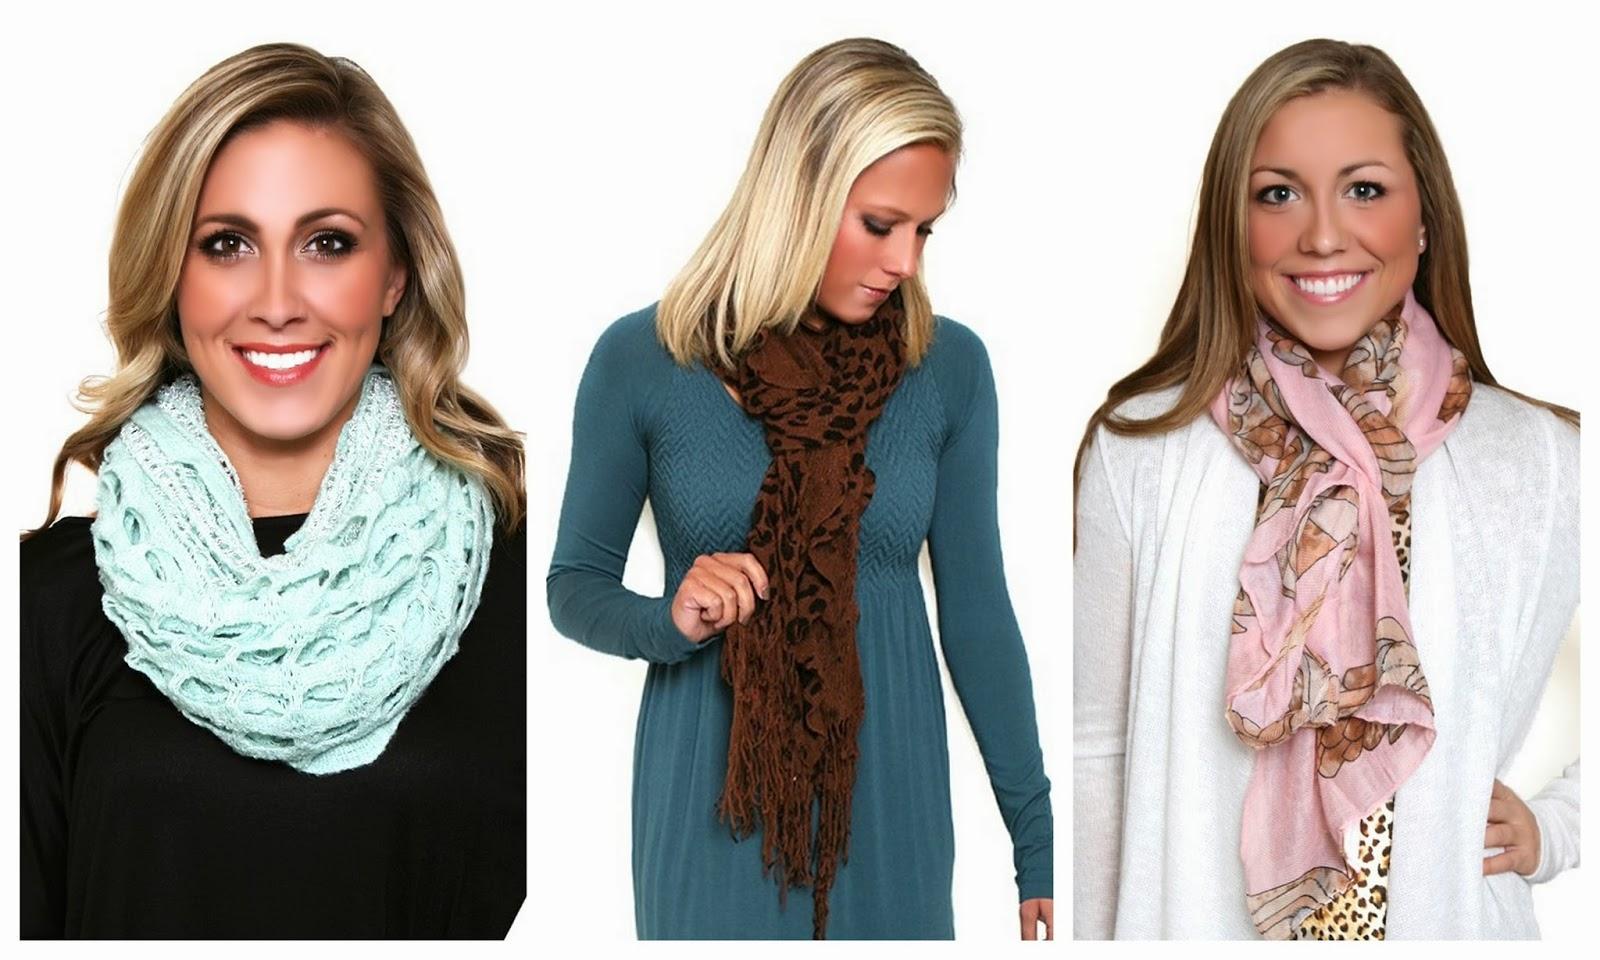 http://flourishboutique.com/catalogsearch/result/?q=scarf